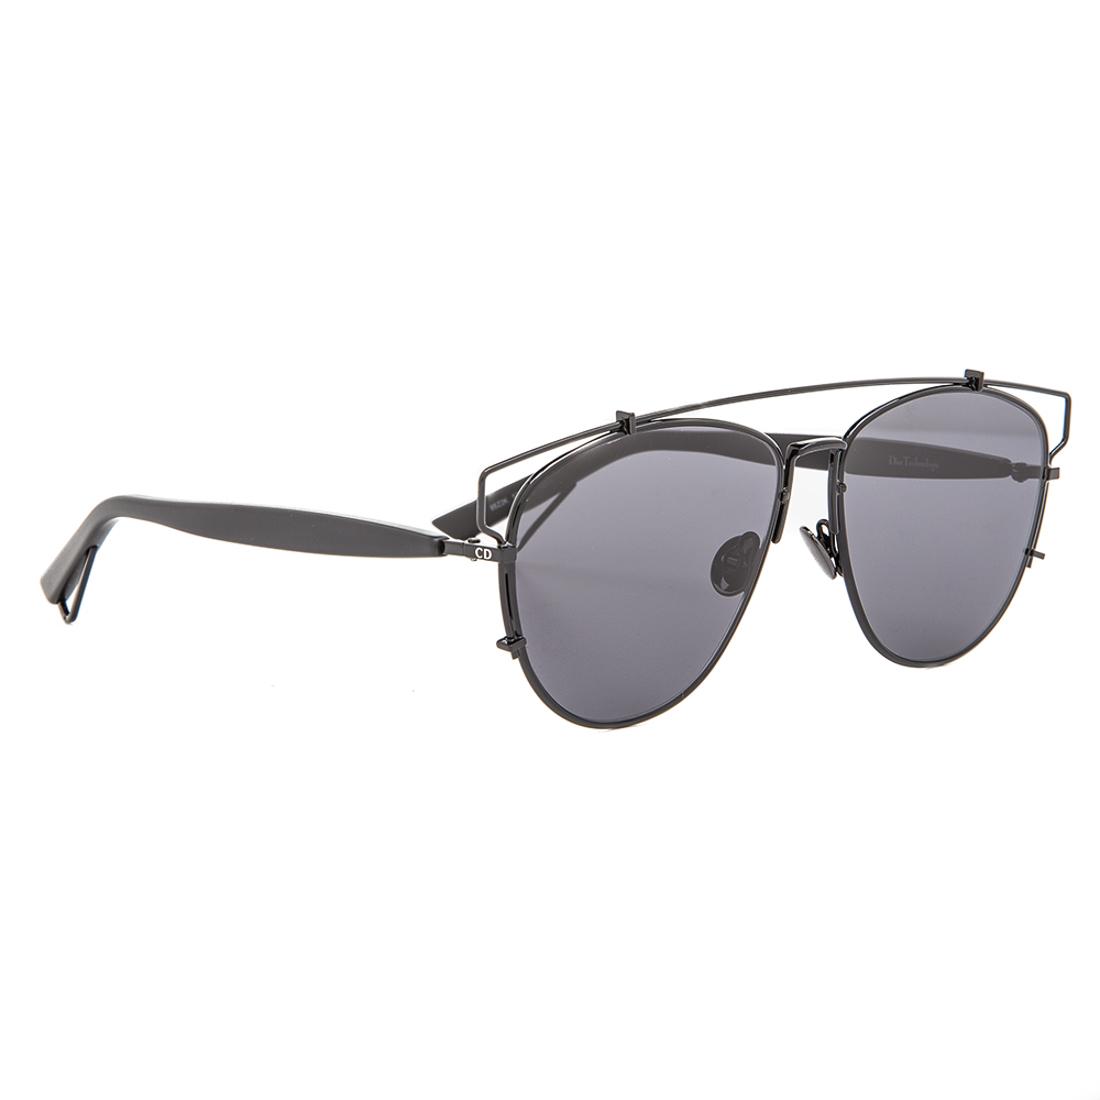 Dior Black Frame Glasses : Dior Technologic Aviator Sunglasses 65Z2K Black Frame ...